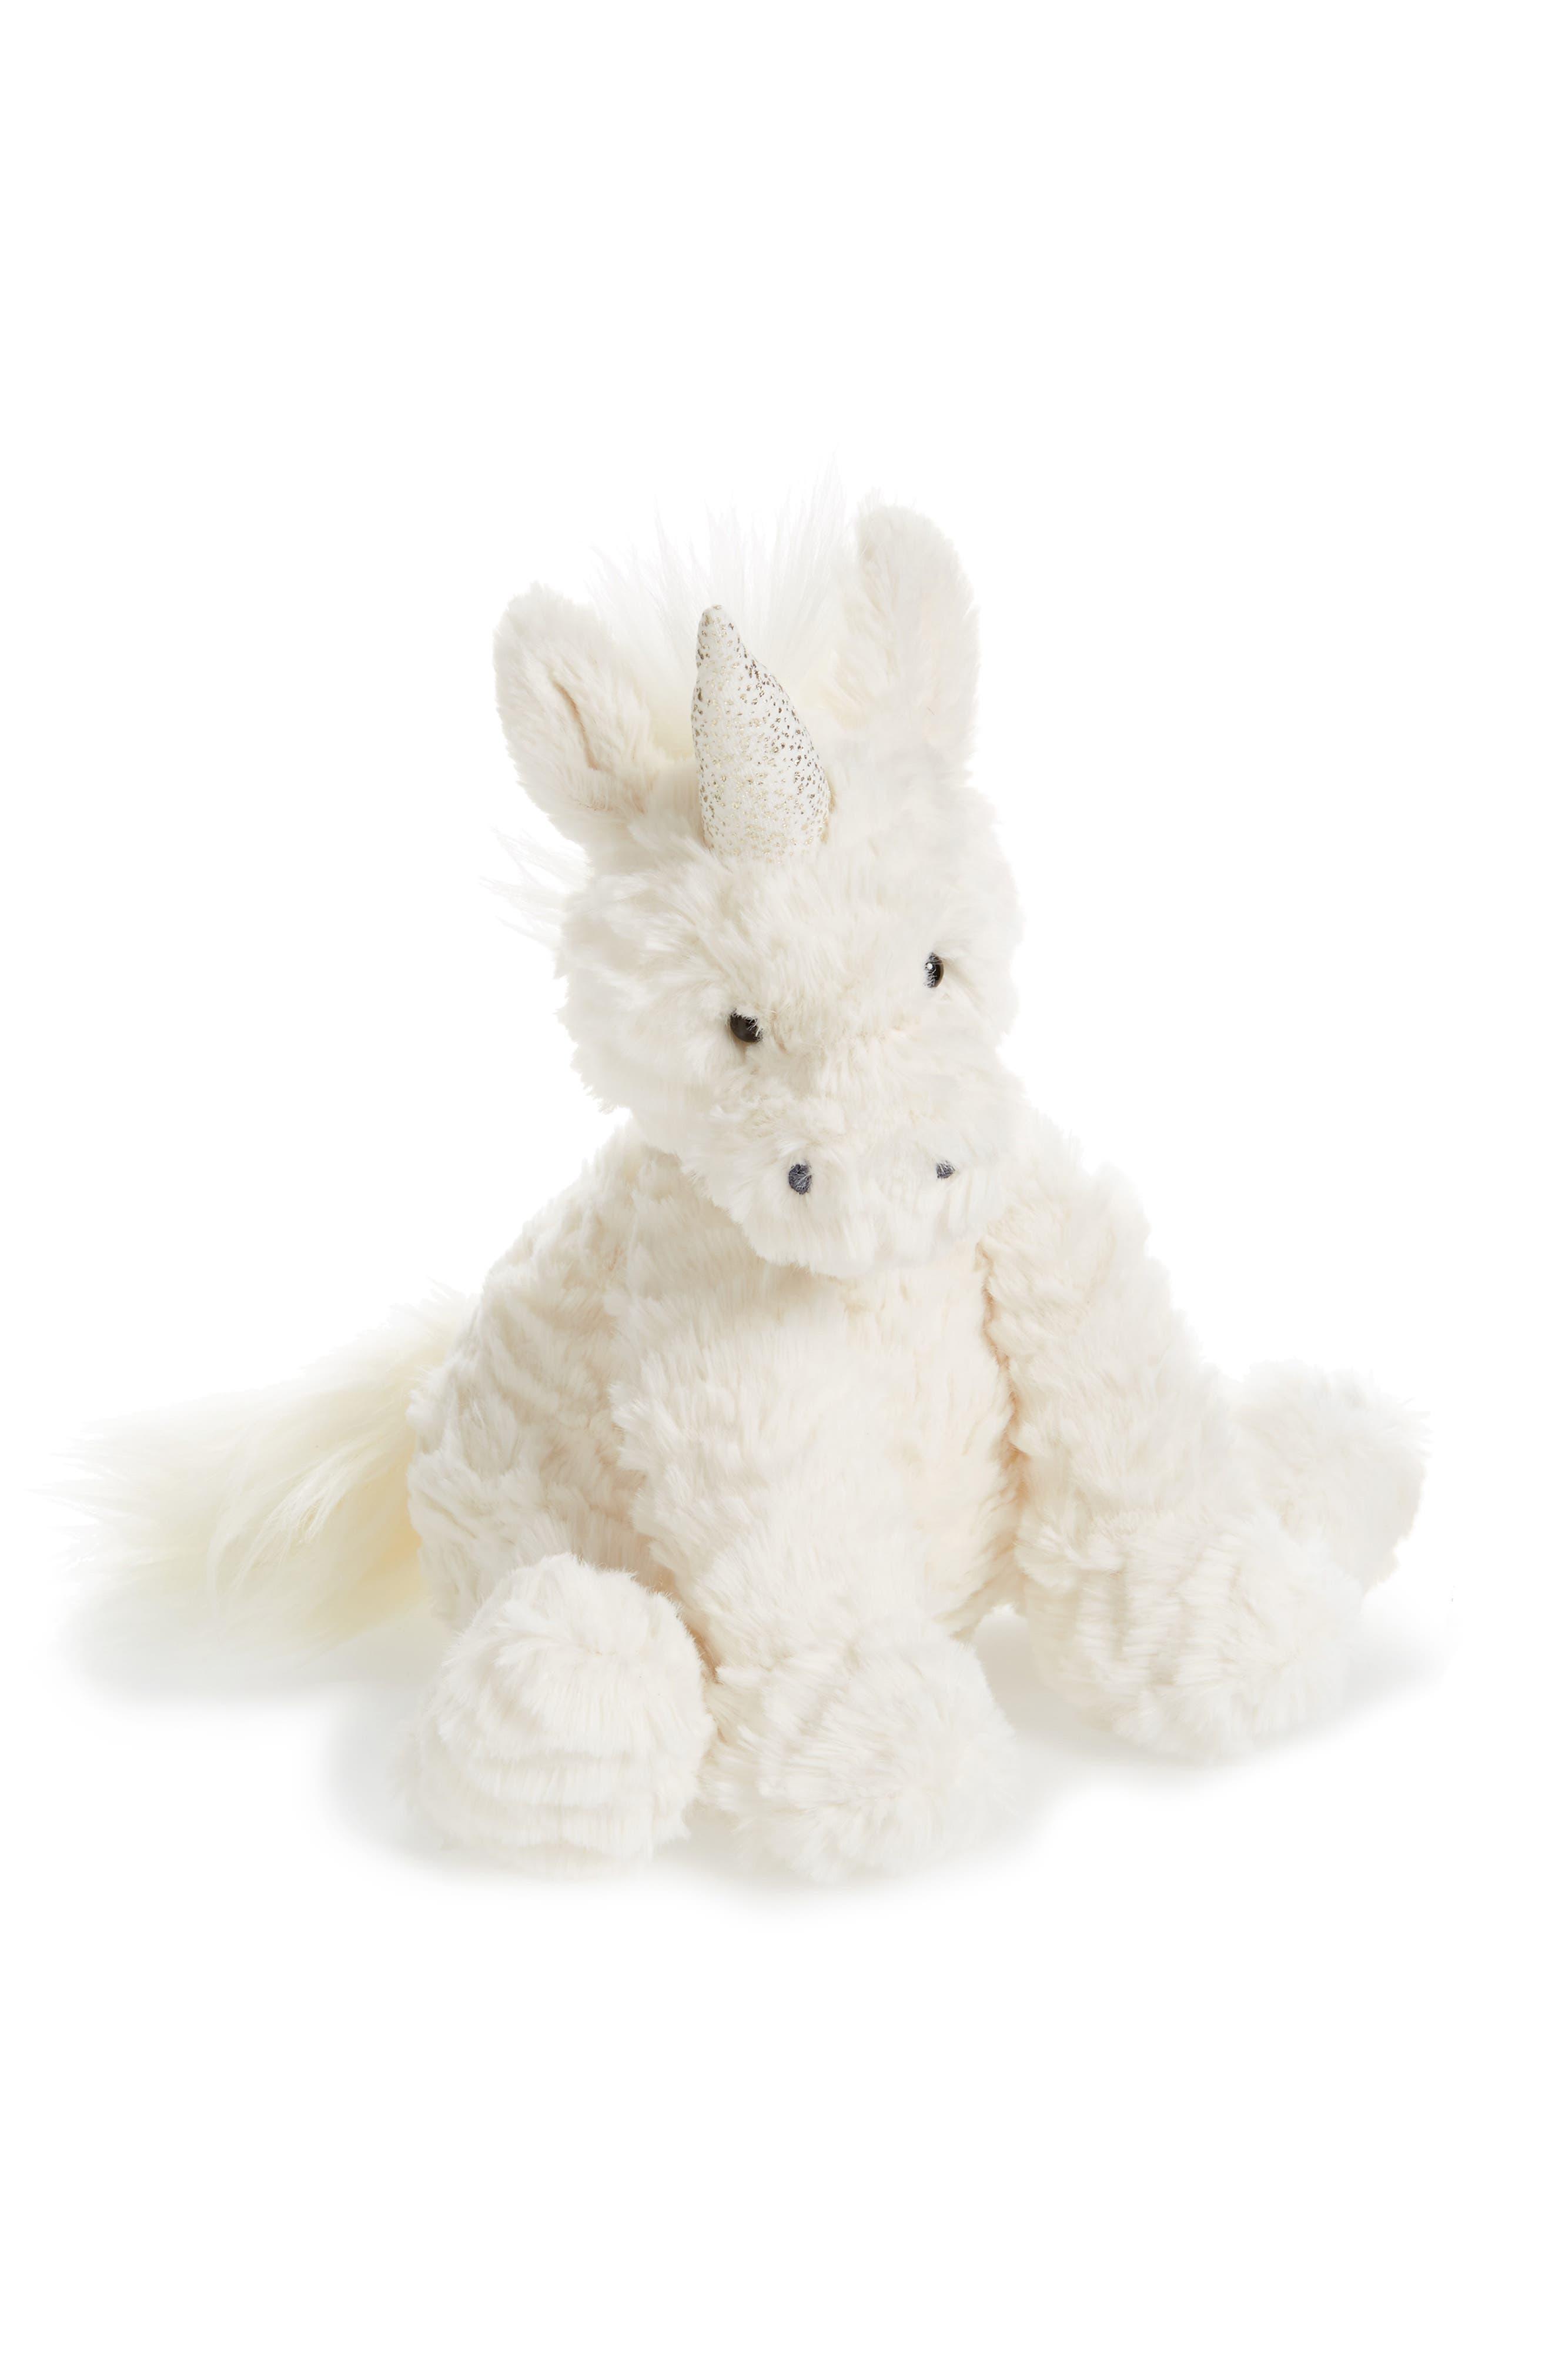 JELLYCAT Fuddlewuddle Medium Unicorn Stuffed Animal, Main, color, 102